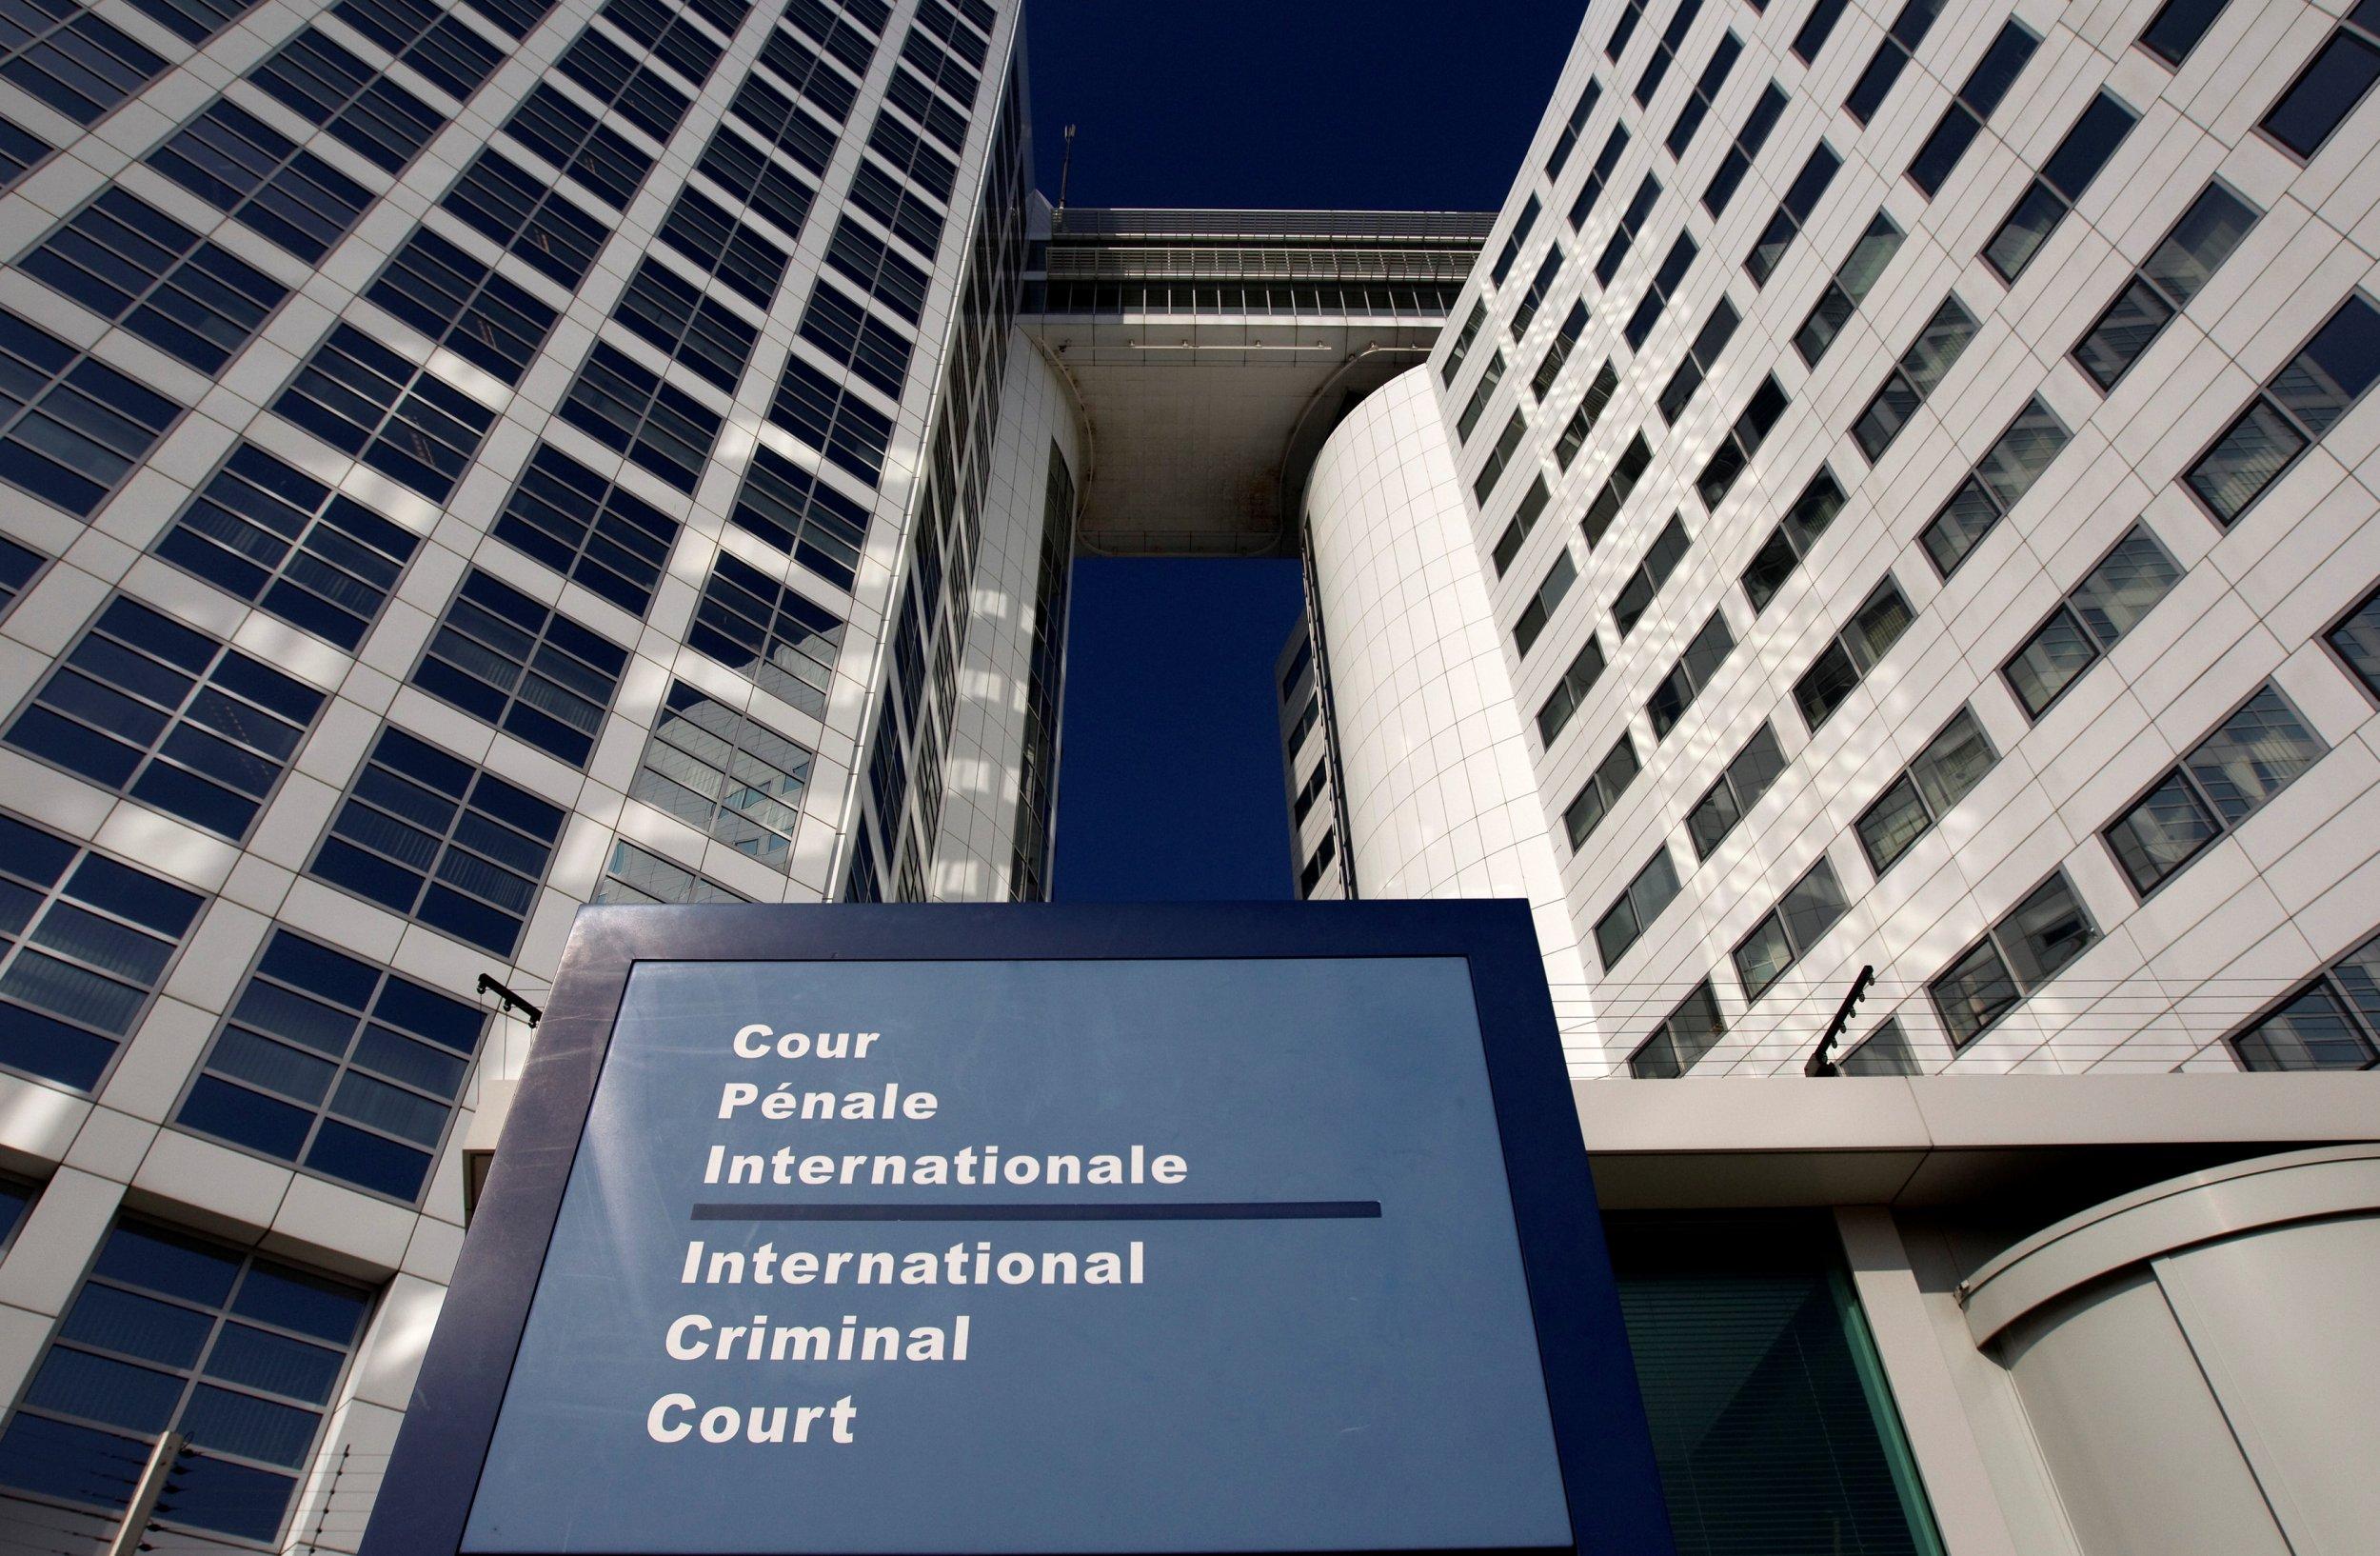 ICC entrance